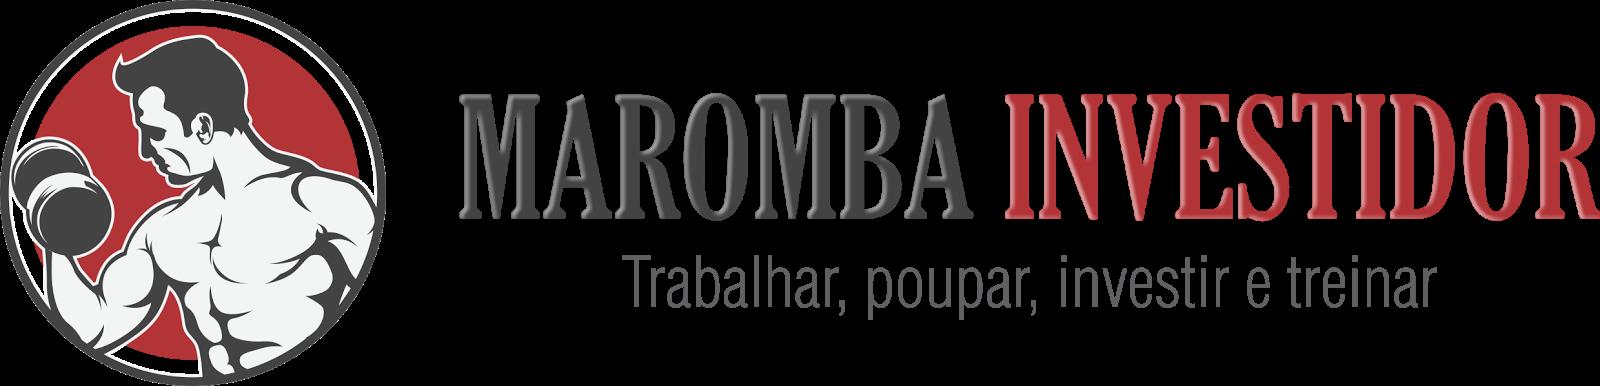 Maromba Investidor